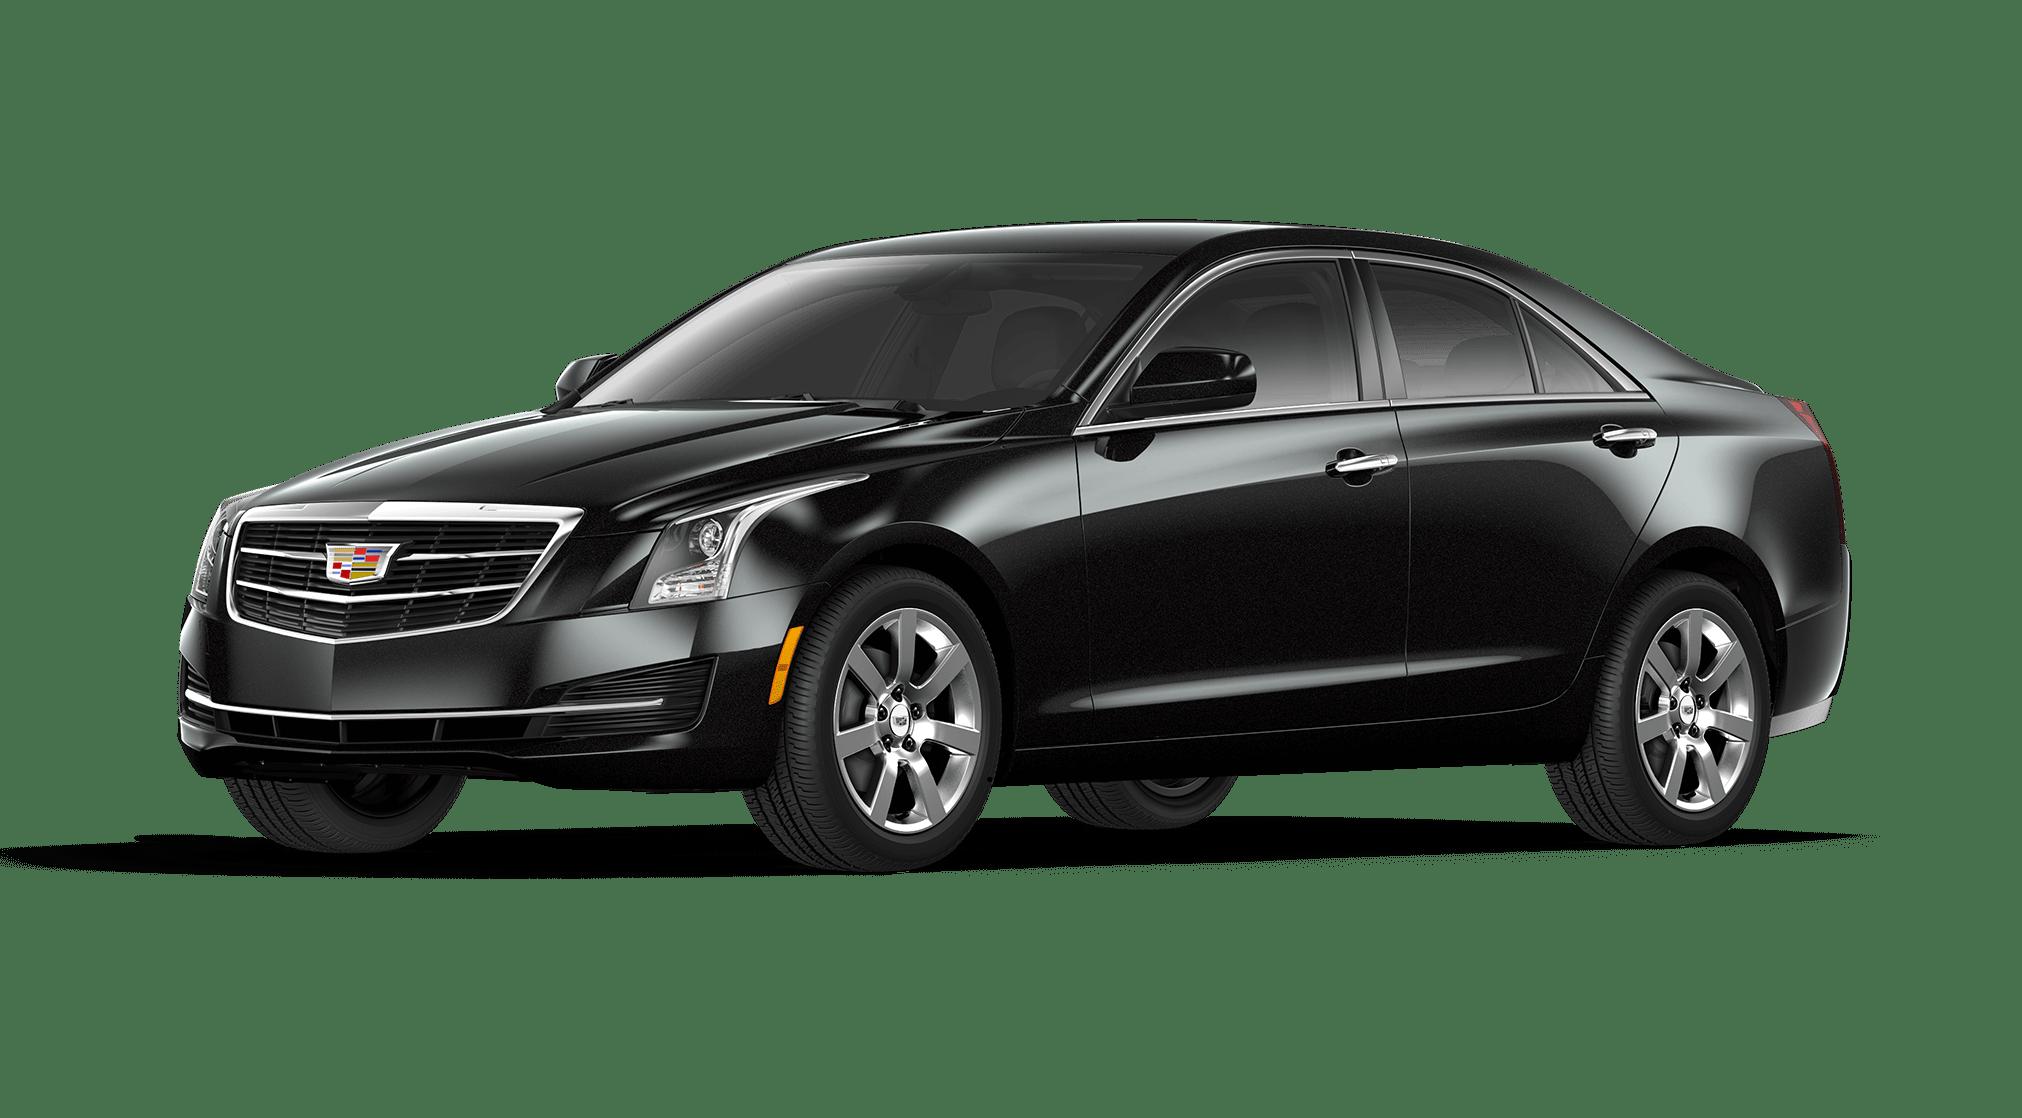 Stellar Black Cadillac ATS